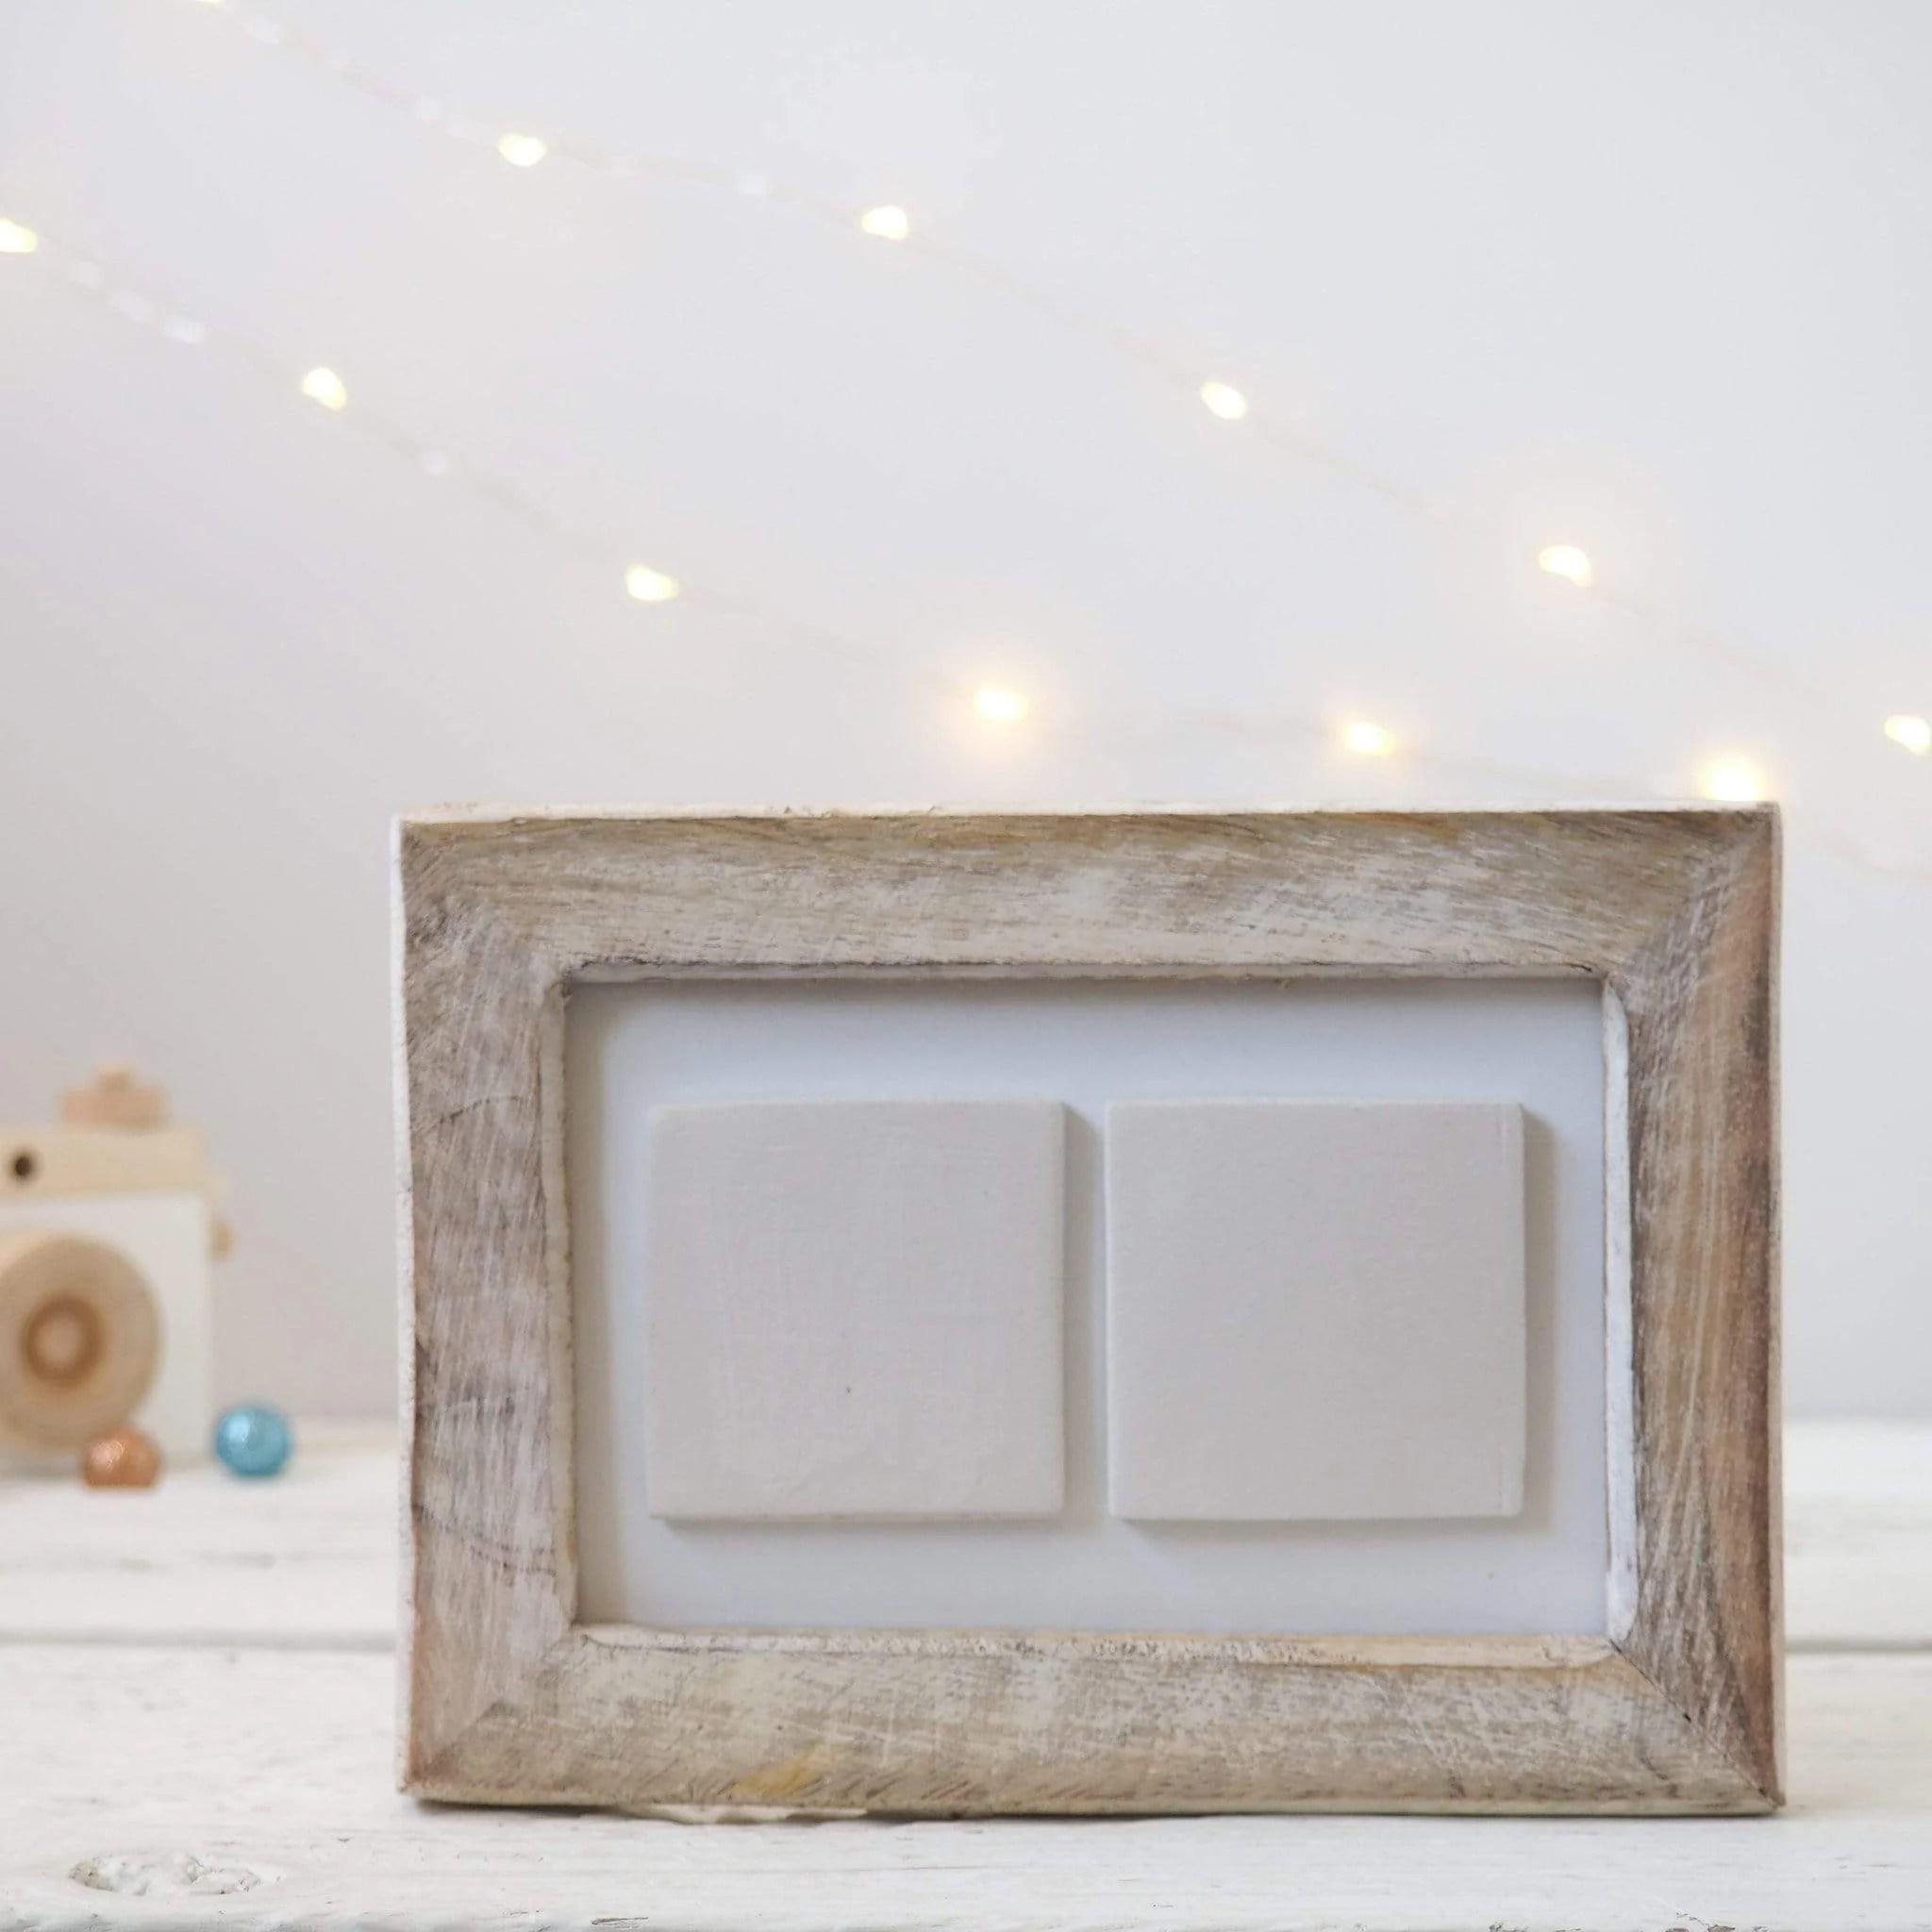 two ceramic tile photo frame white washed wood